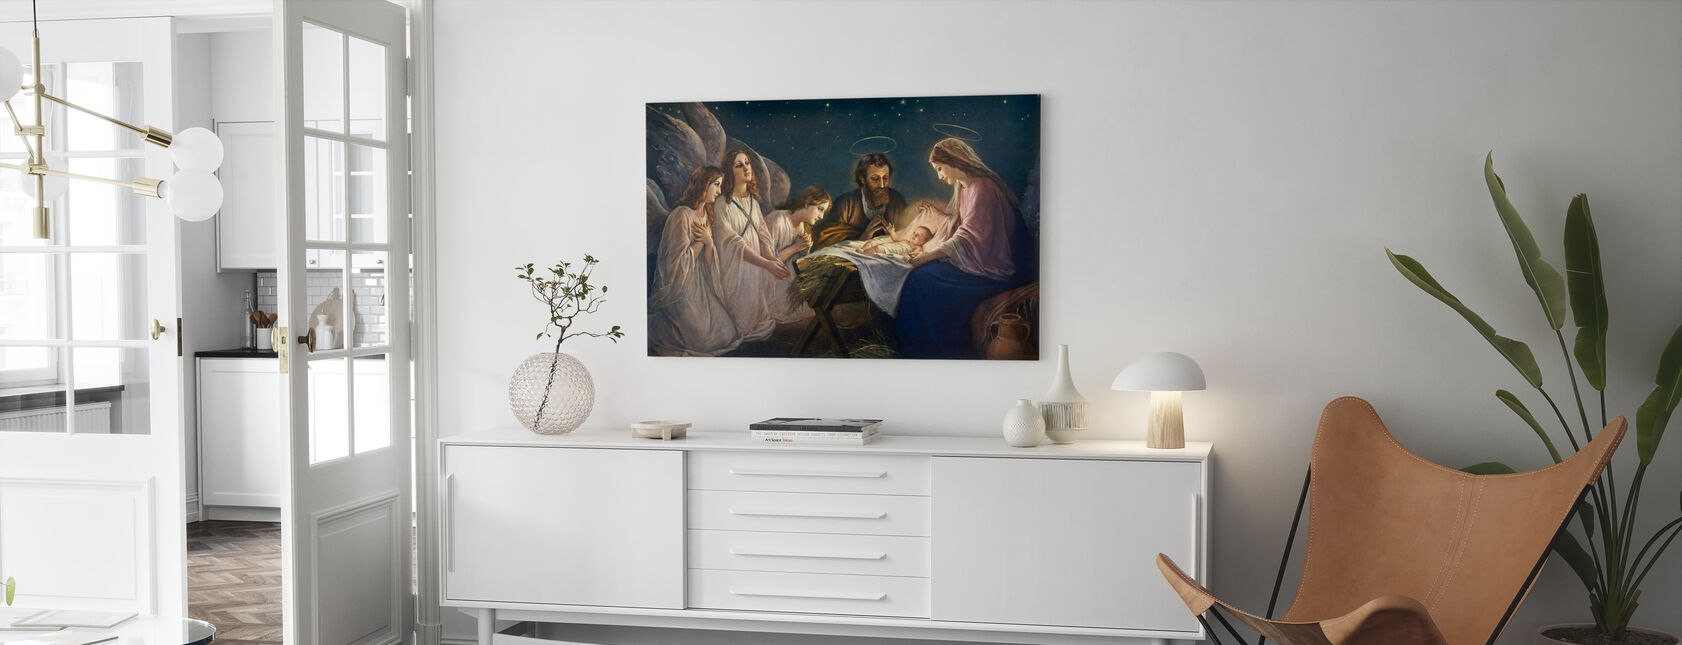 Josef og Maria - Lerretsbilde - Stue